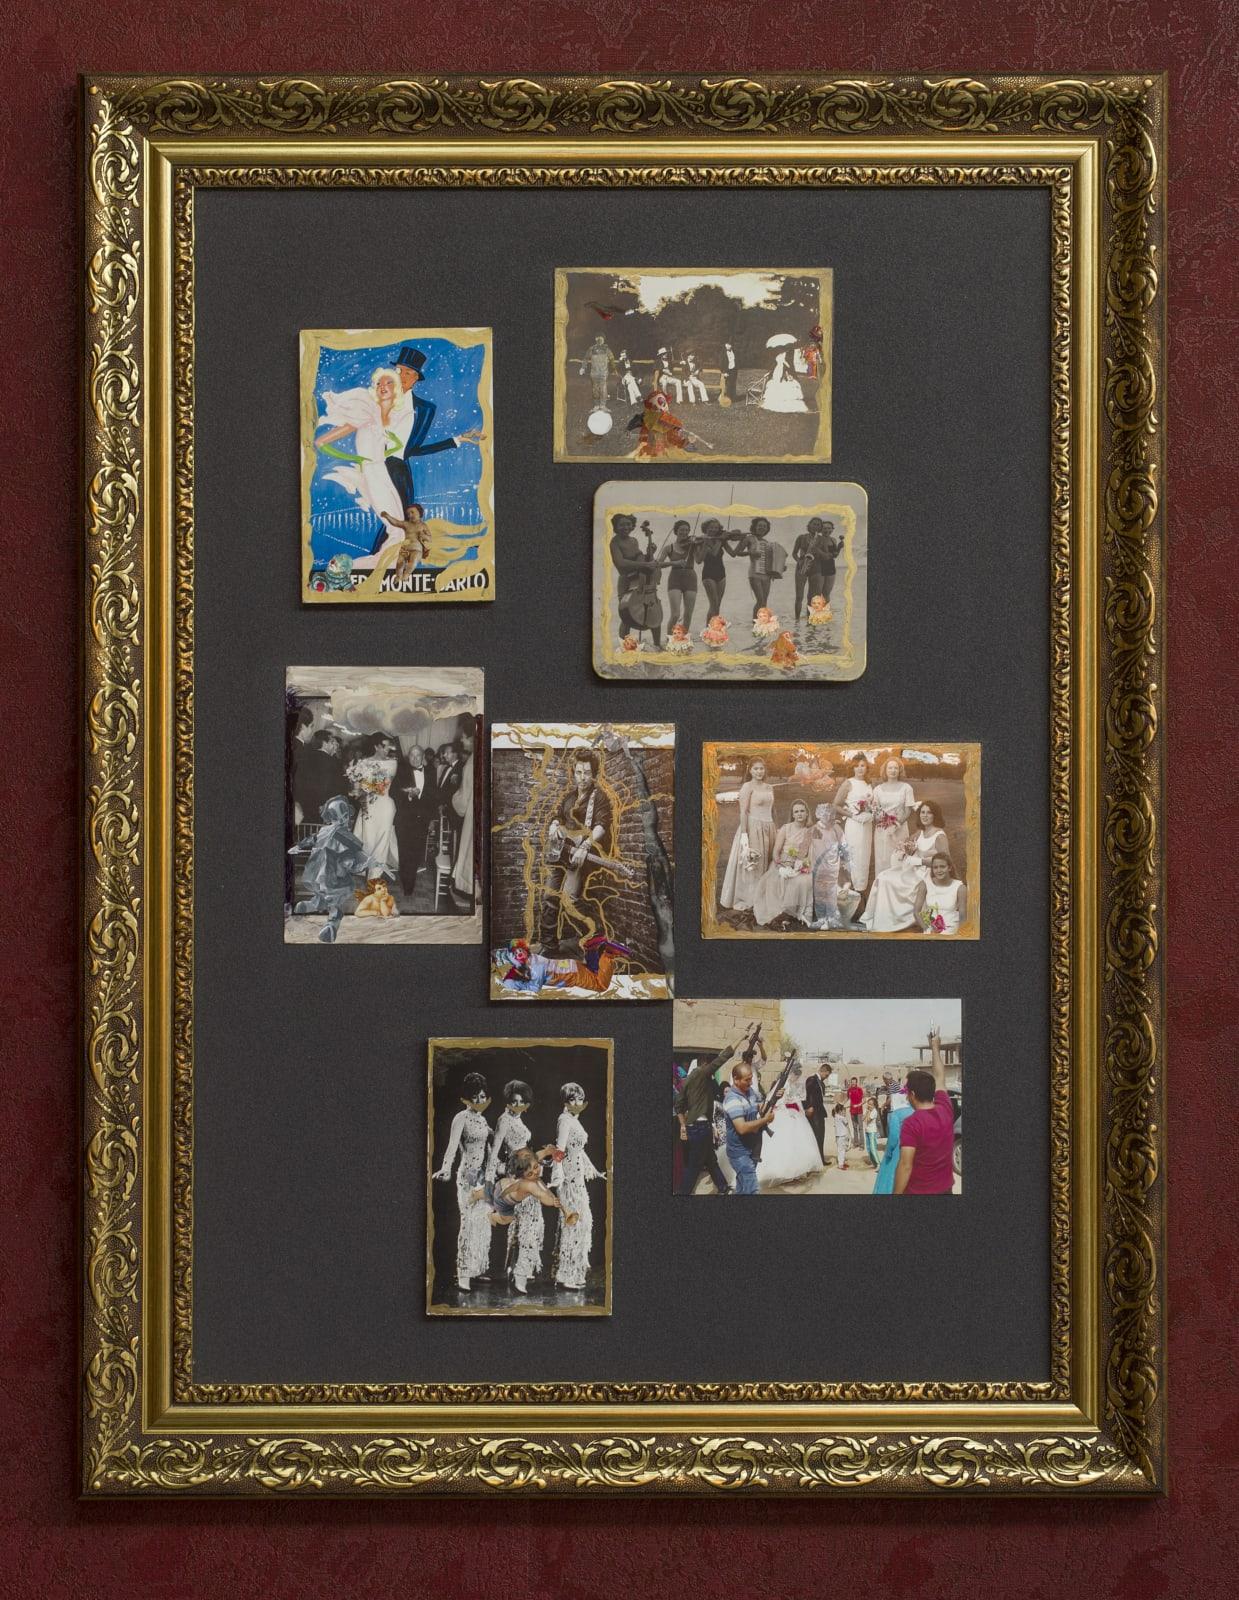 Wedding 2020 postcards and mixed media 78 x 60 cm